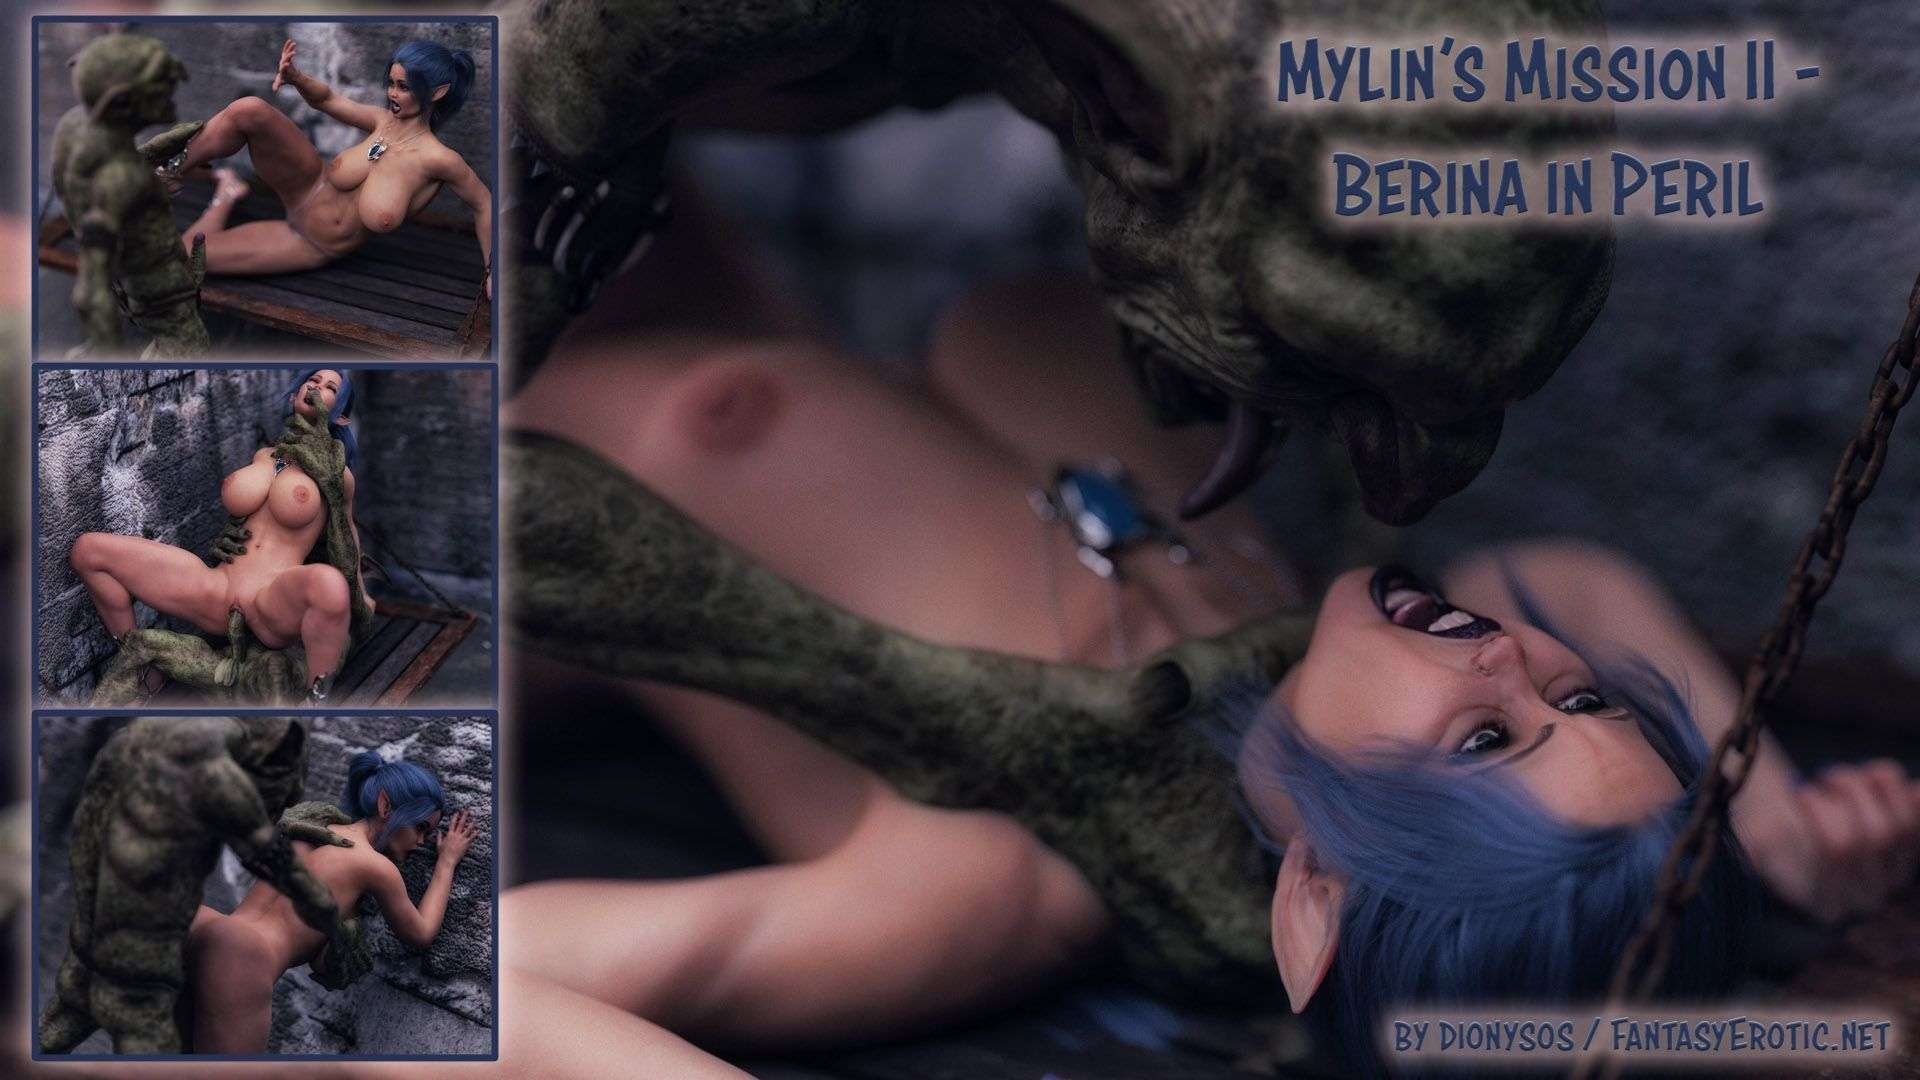 Mylins-Mission2-Promo1